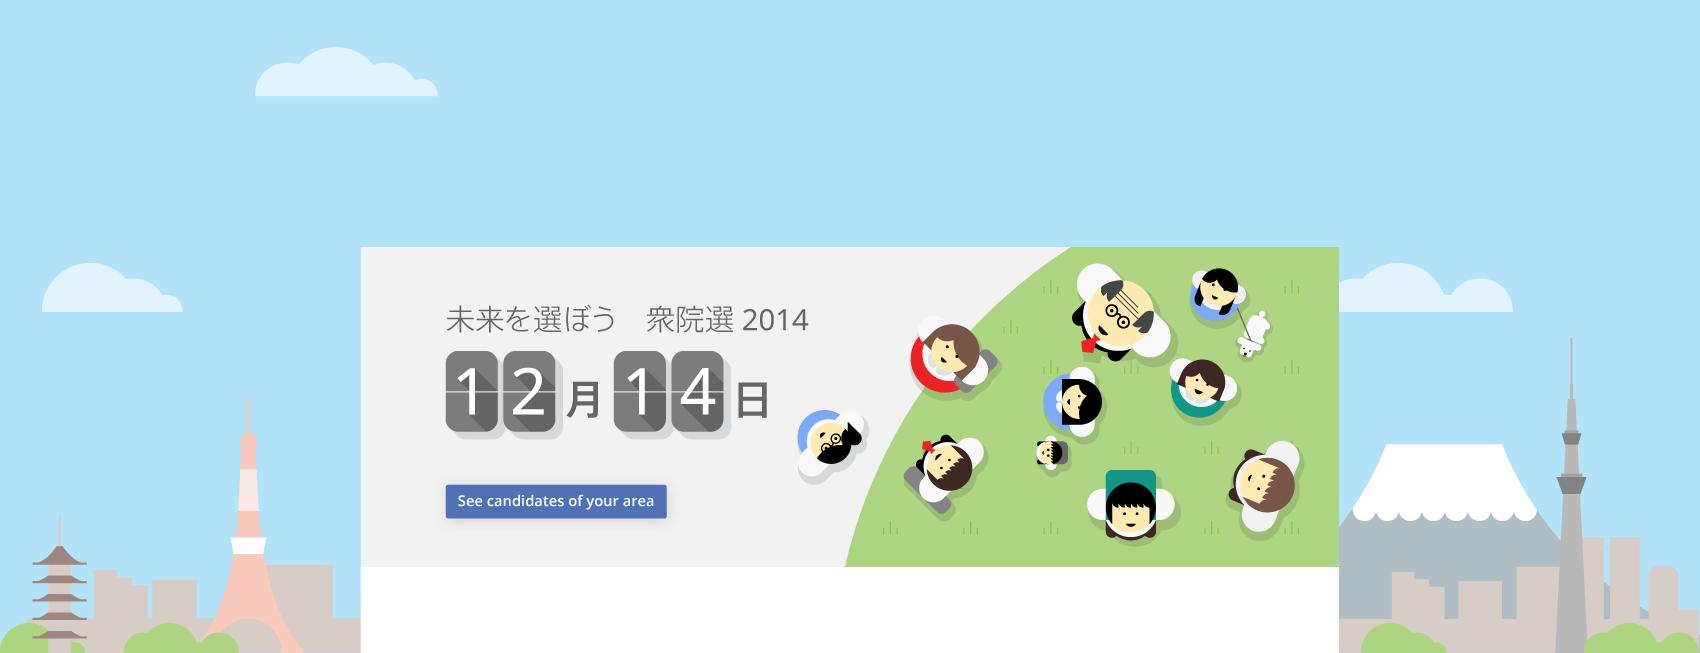 Google Japan 2015 Election Illustrations